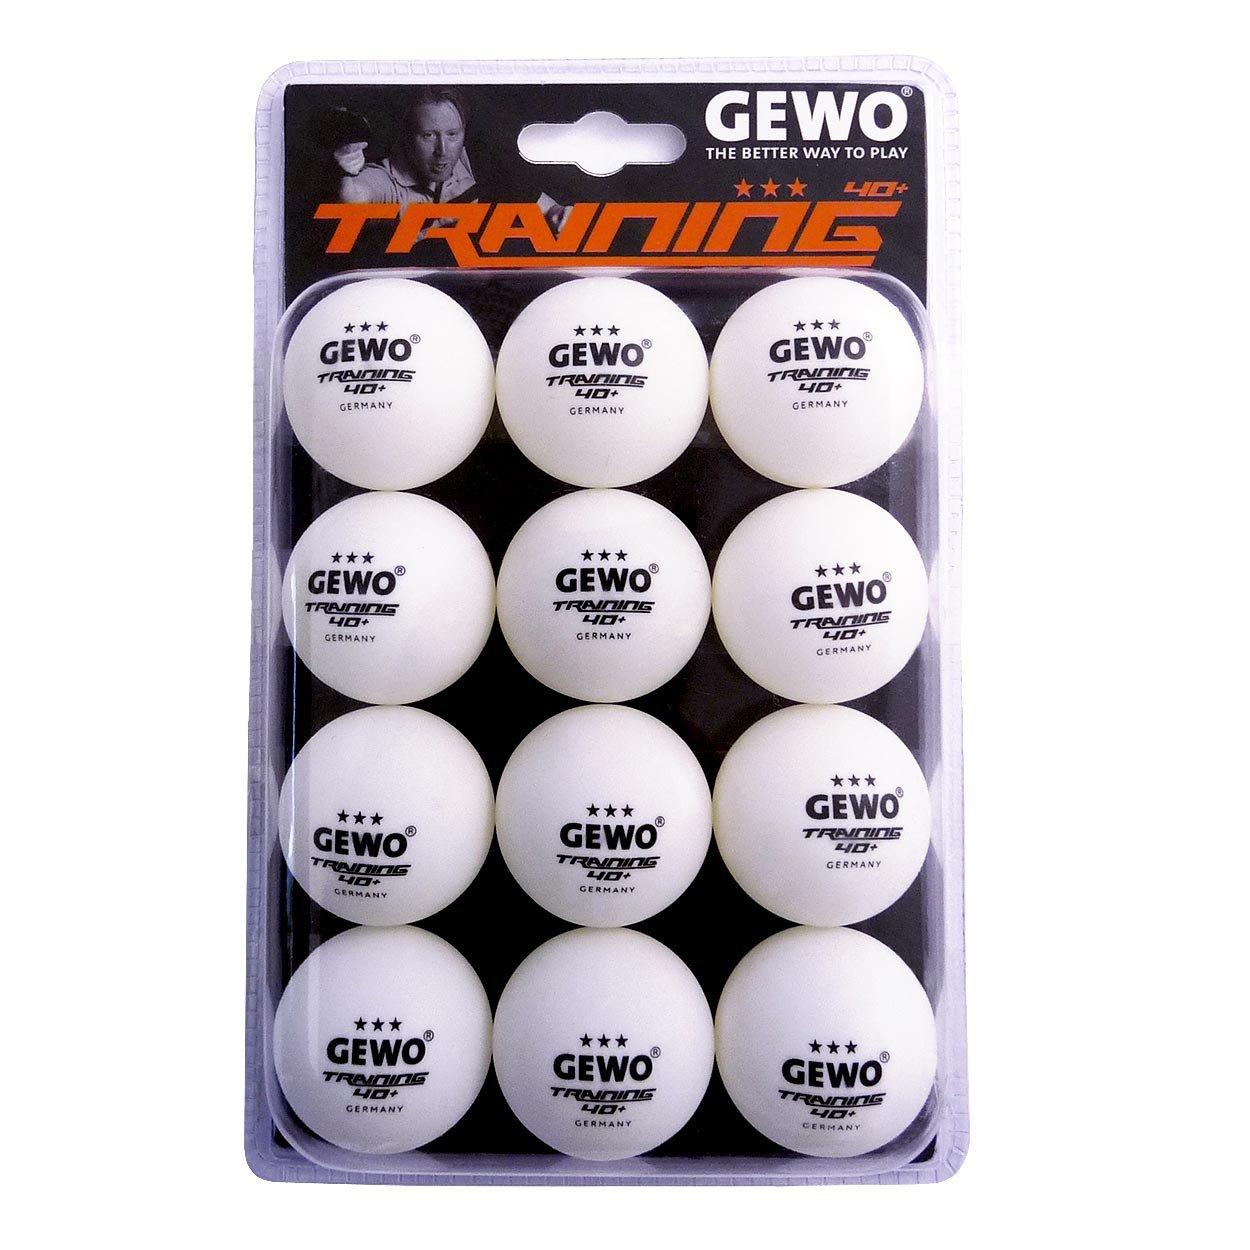 GEWO Trainingsball *** 40+ 12er Weiß 40 mm GEWO6|#GEWO 85931200